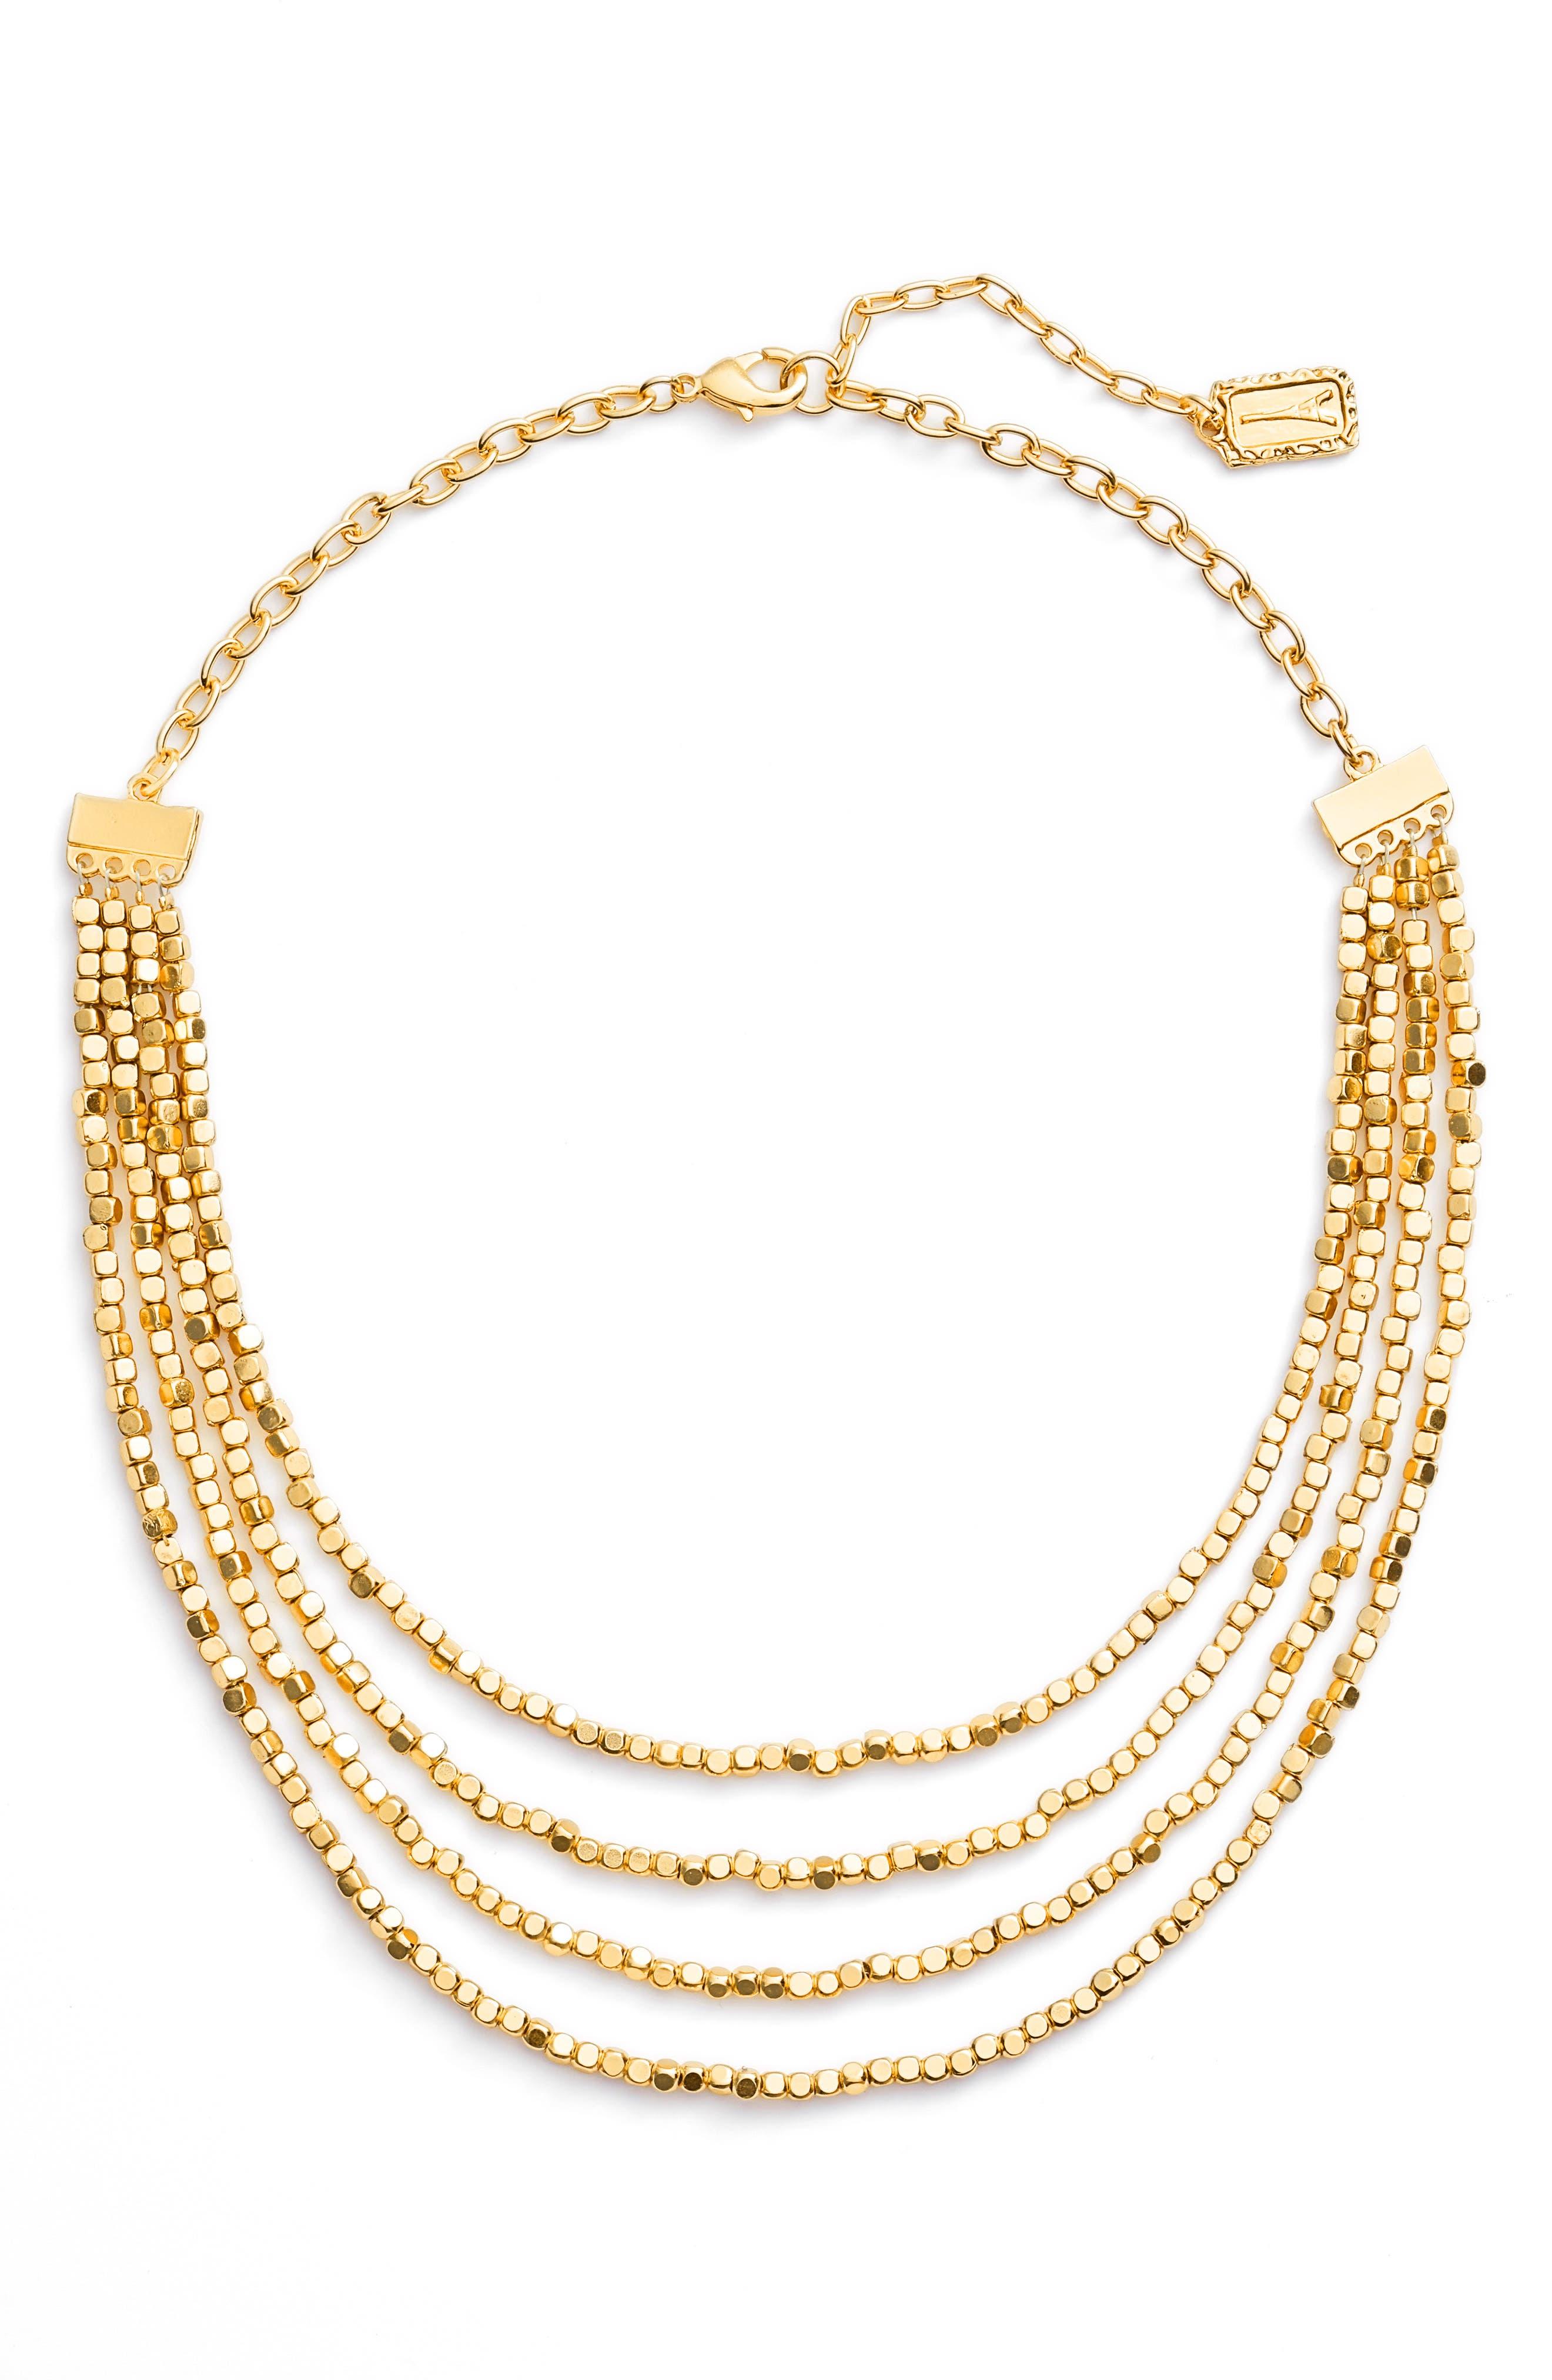 Main Image - Karine Sultan Ava Collar Necklace